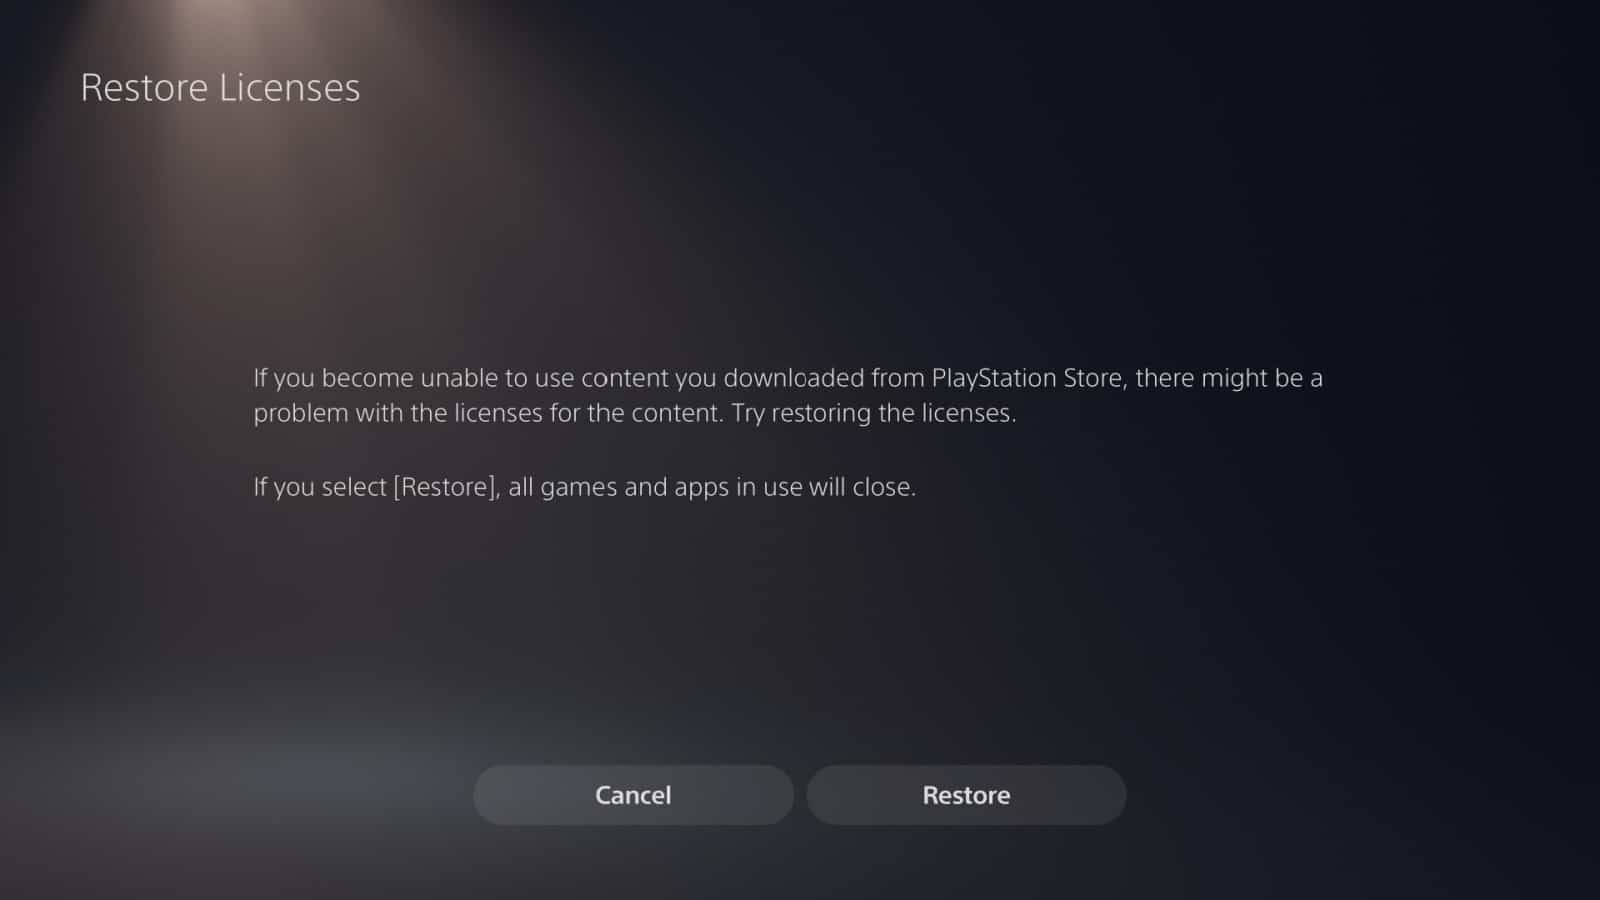 PS5 Restore Licenses 3